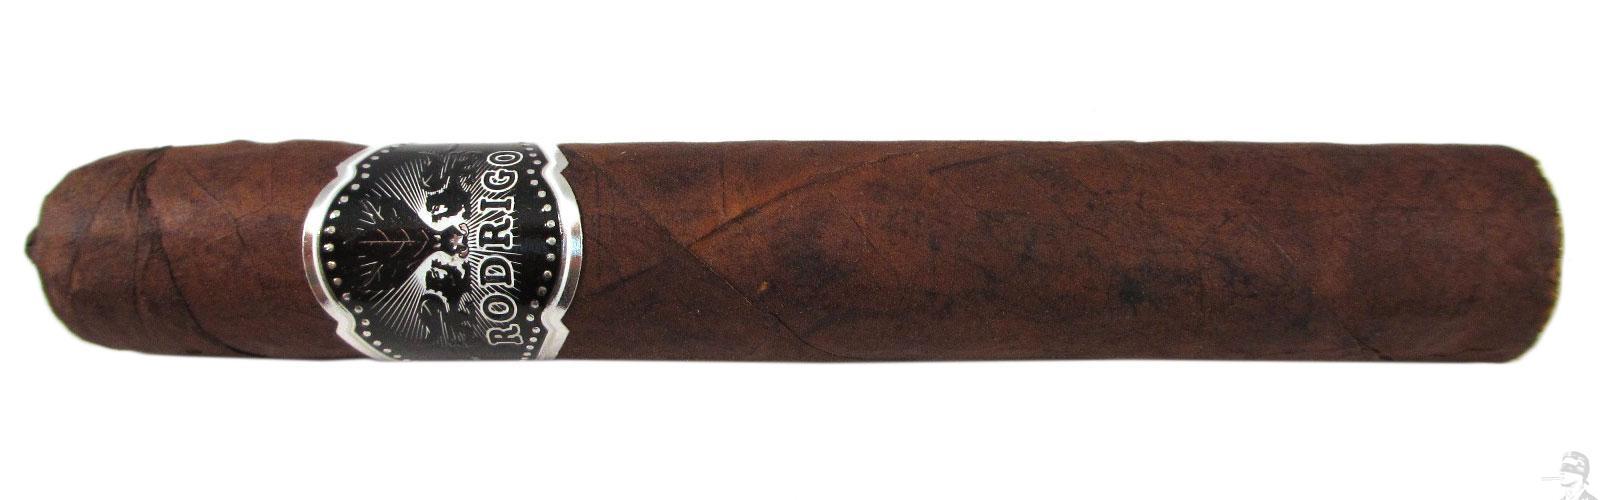 Blind Cigar Review: Rodrigo | La Fortaleza Forte